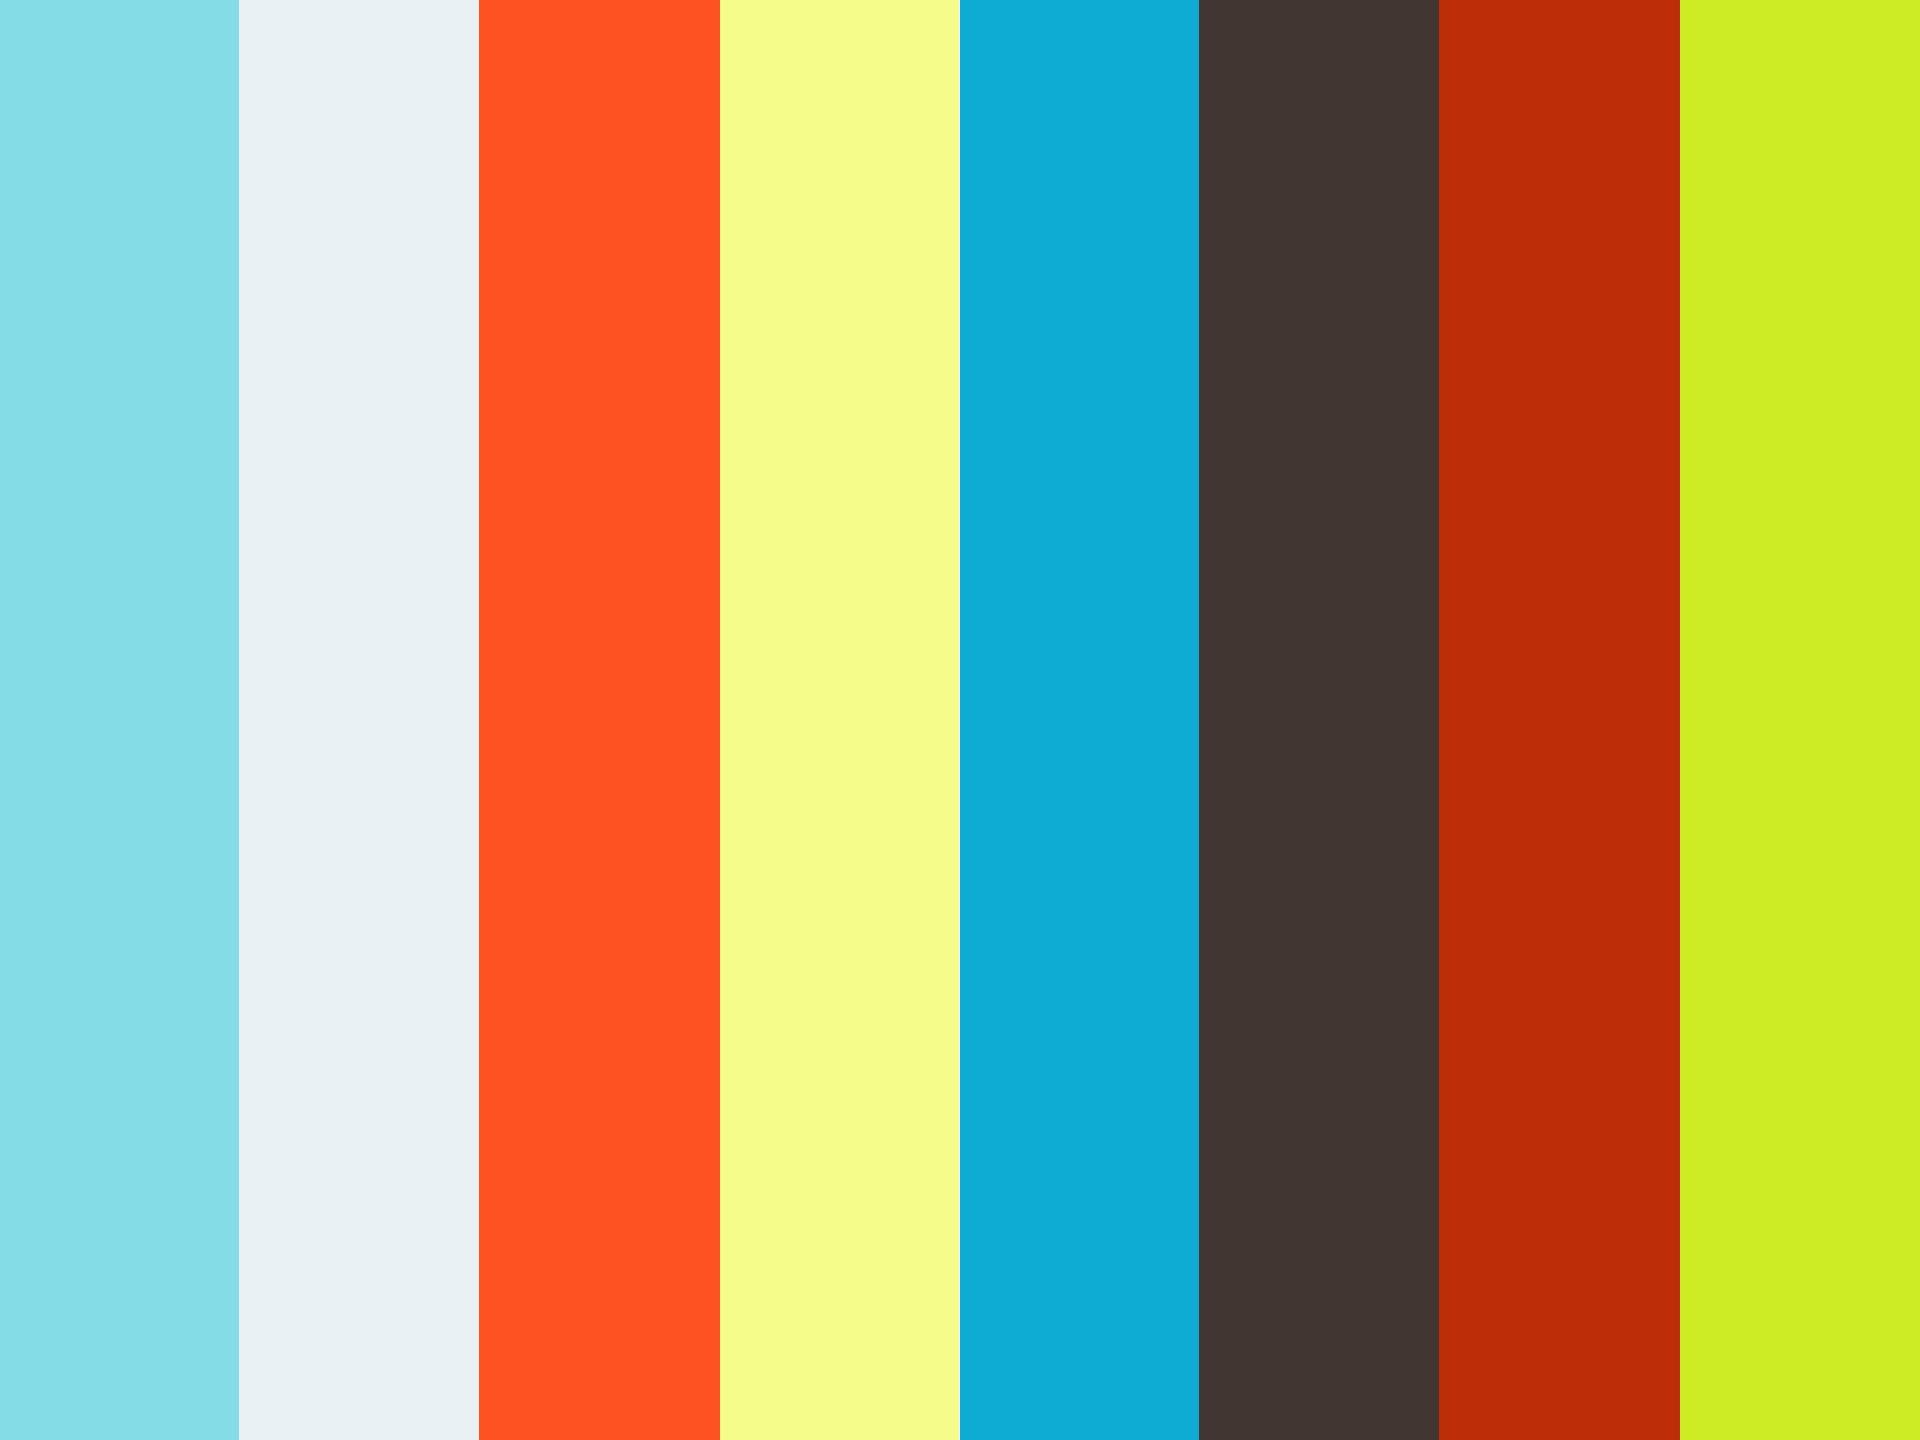 JackPos 2.5 Pos Malware - BotnetServicex on Vimeo